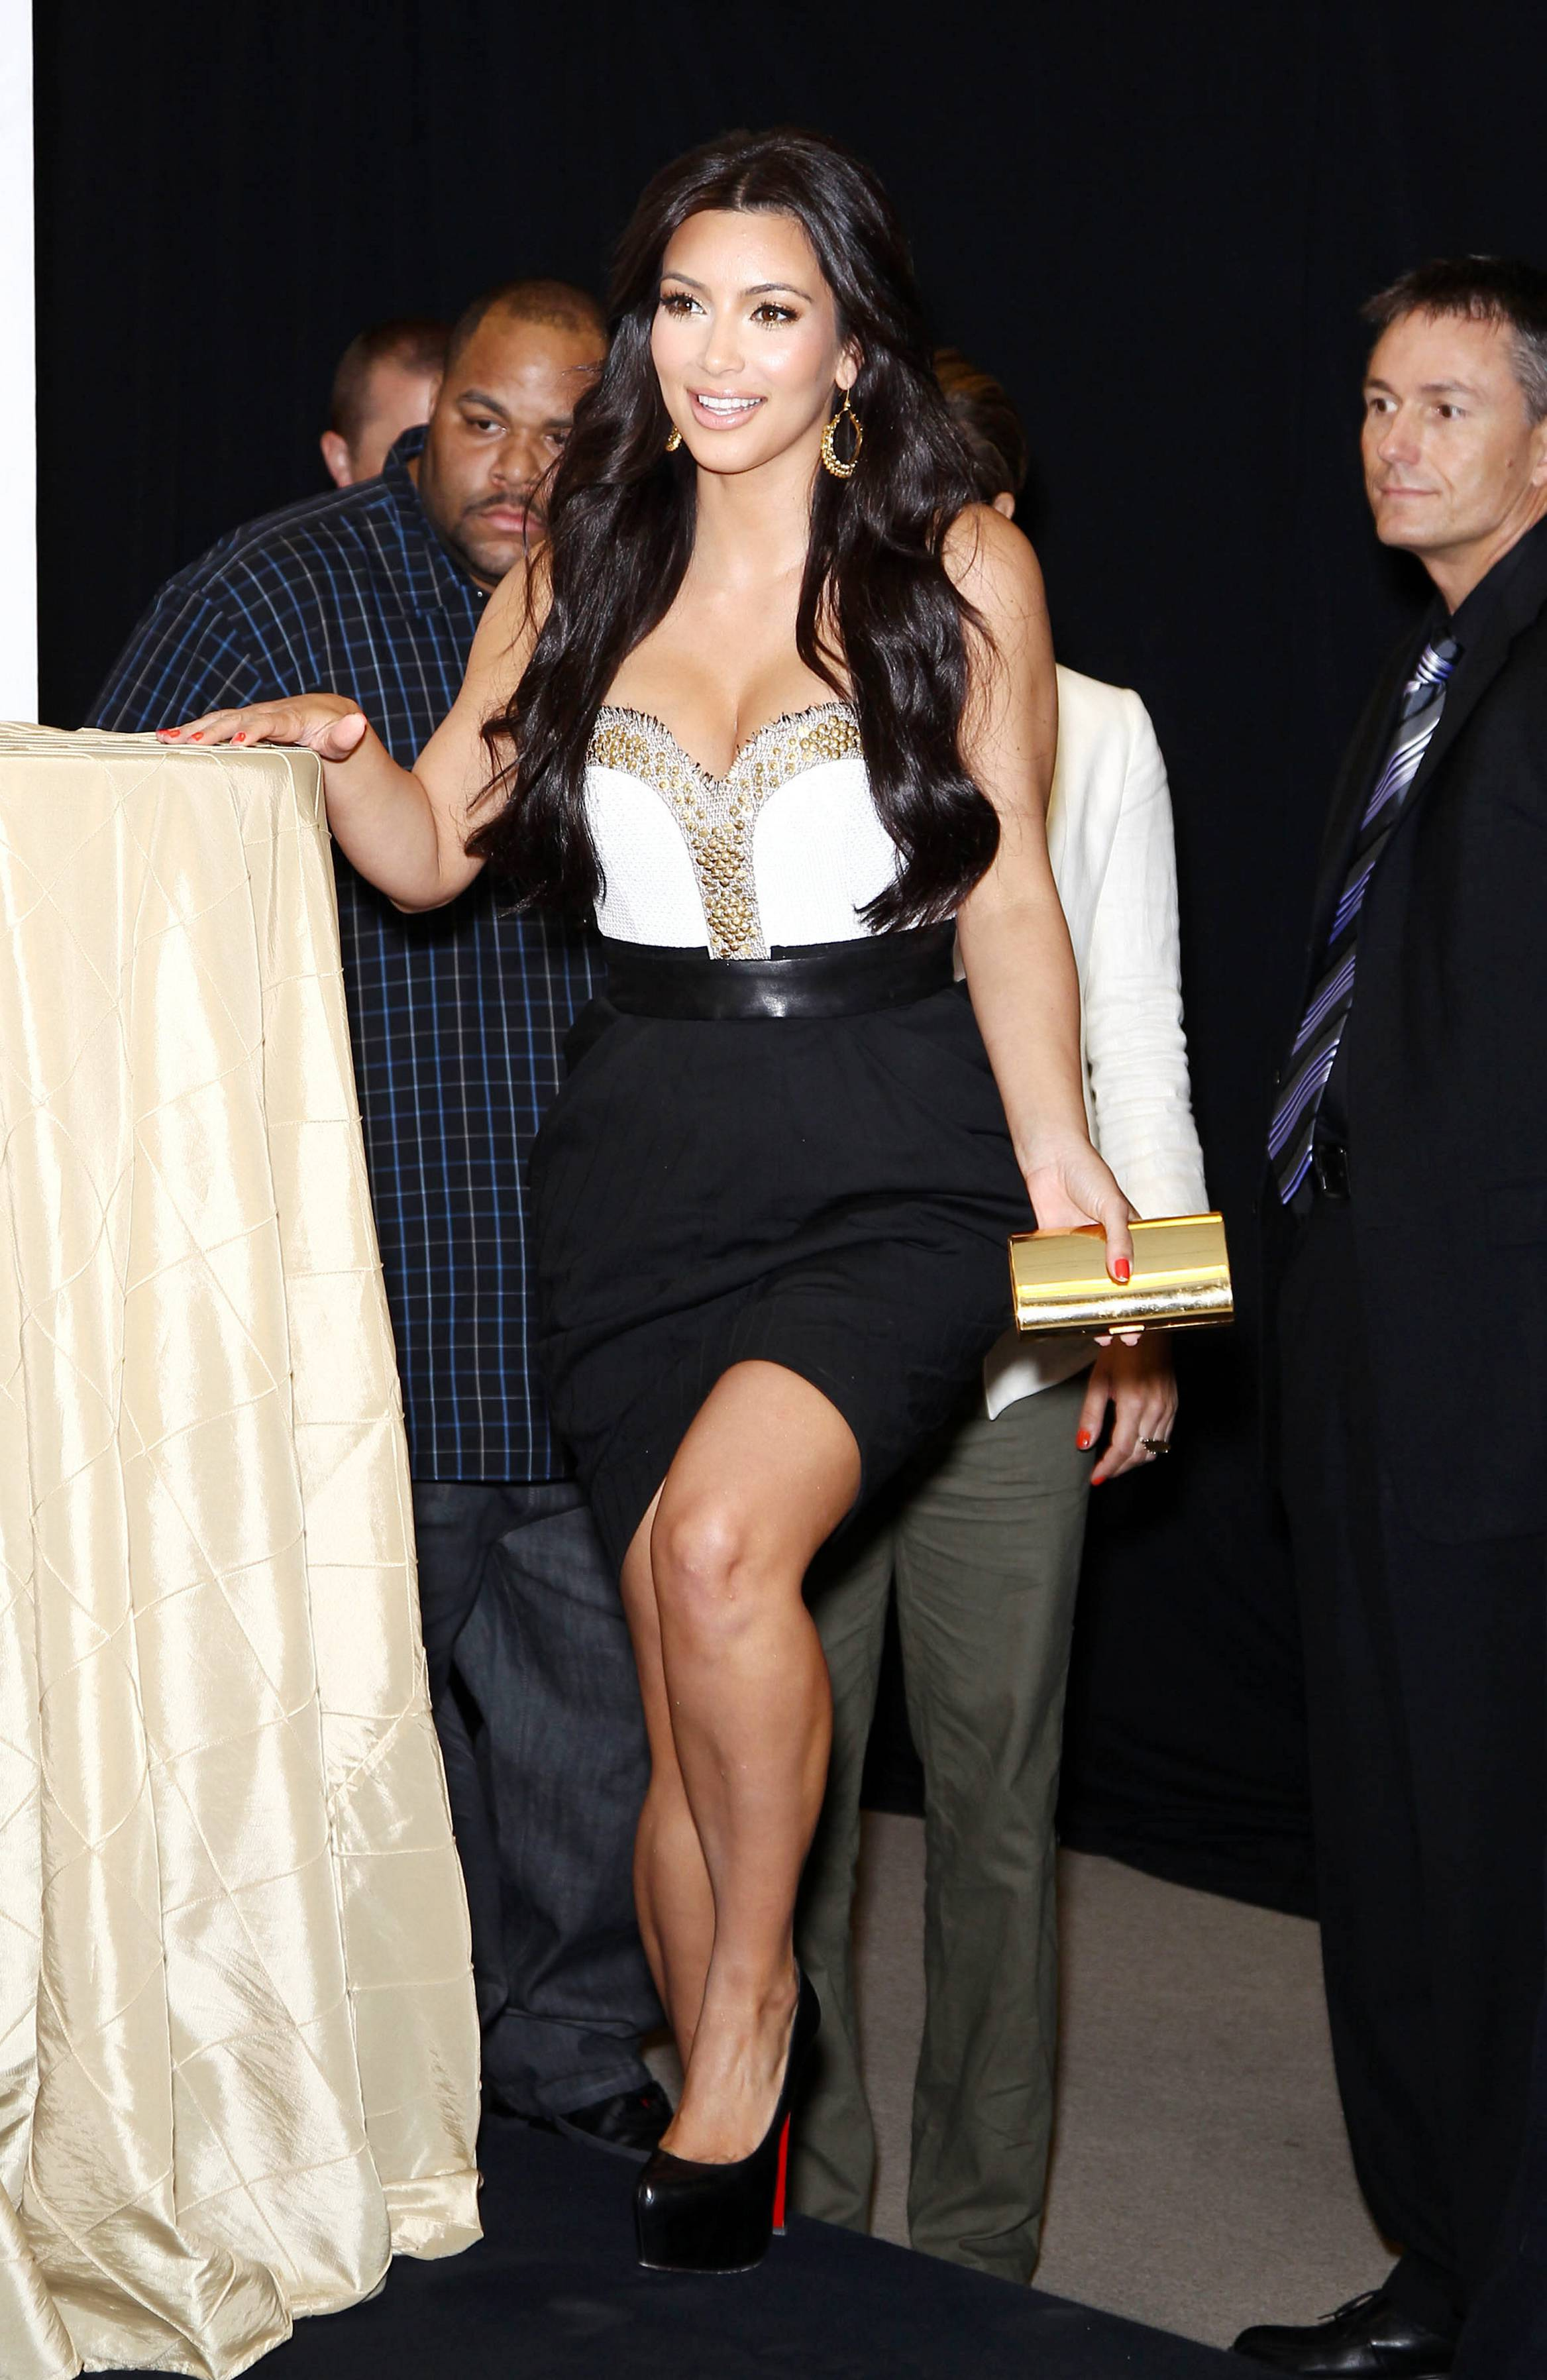 85082_celebrity_paradise.com_Kim_Kardashian_Fragance_22_122_51lo.jpg